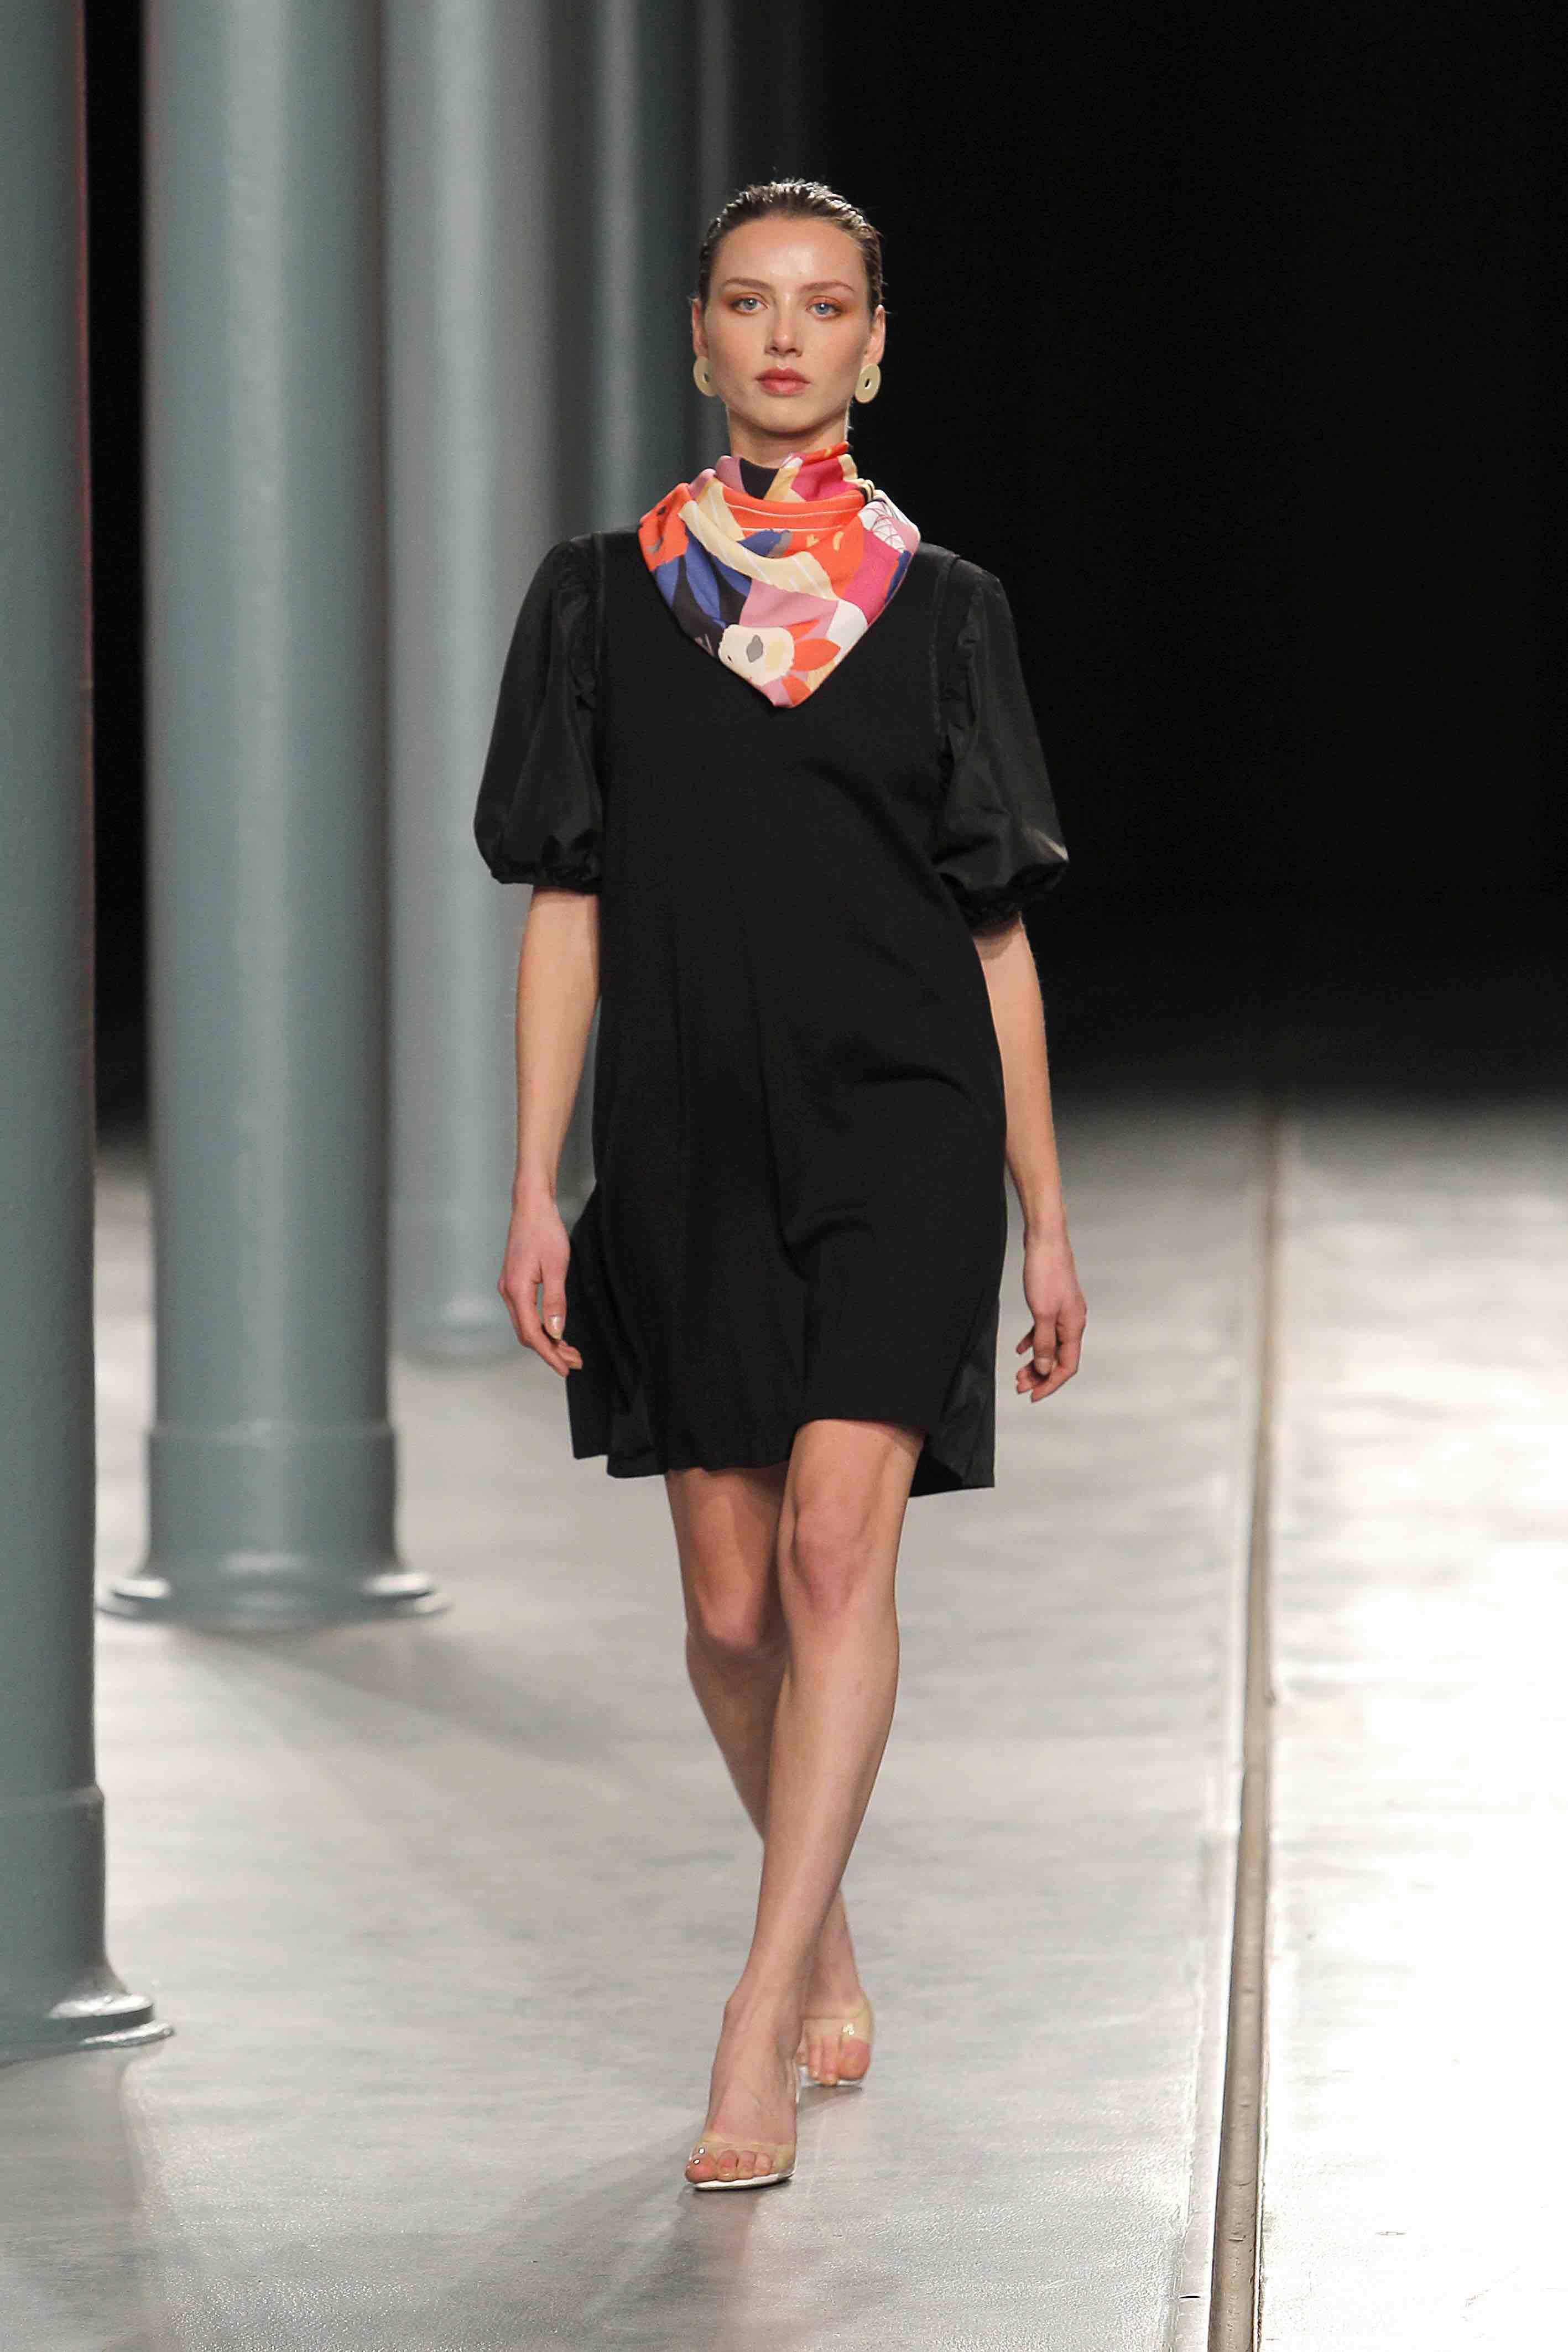 Portugal Fashion #SofaEdition 16